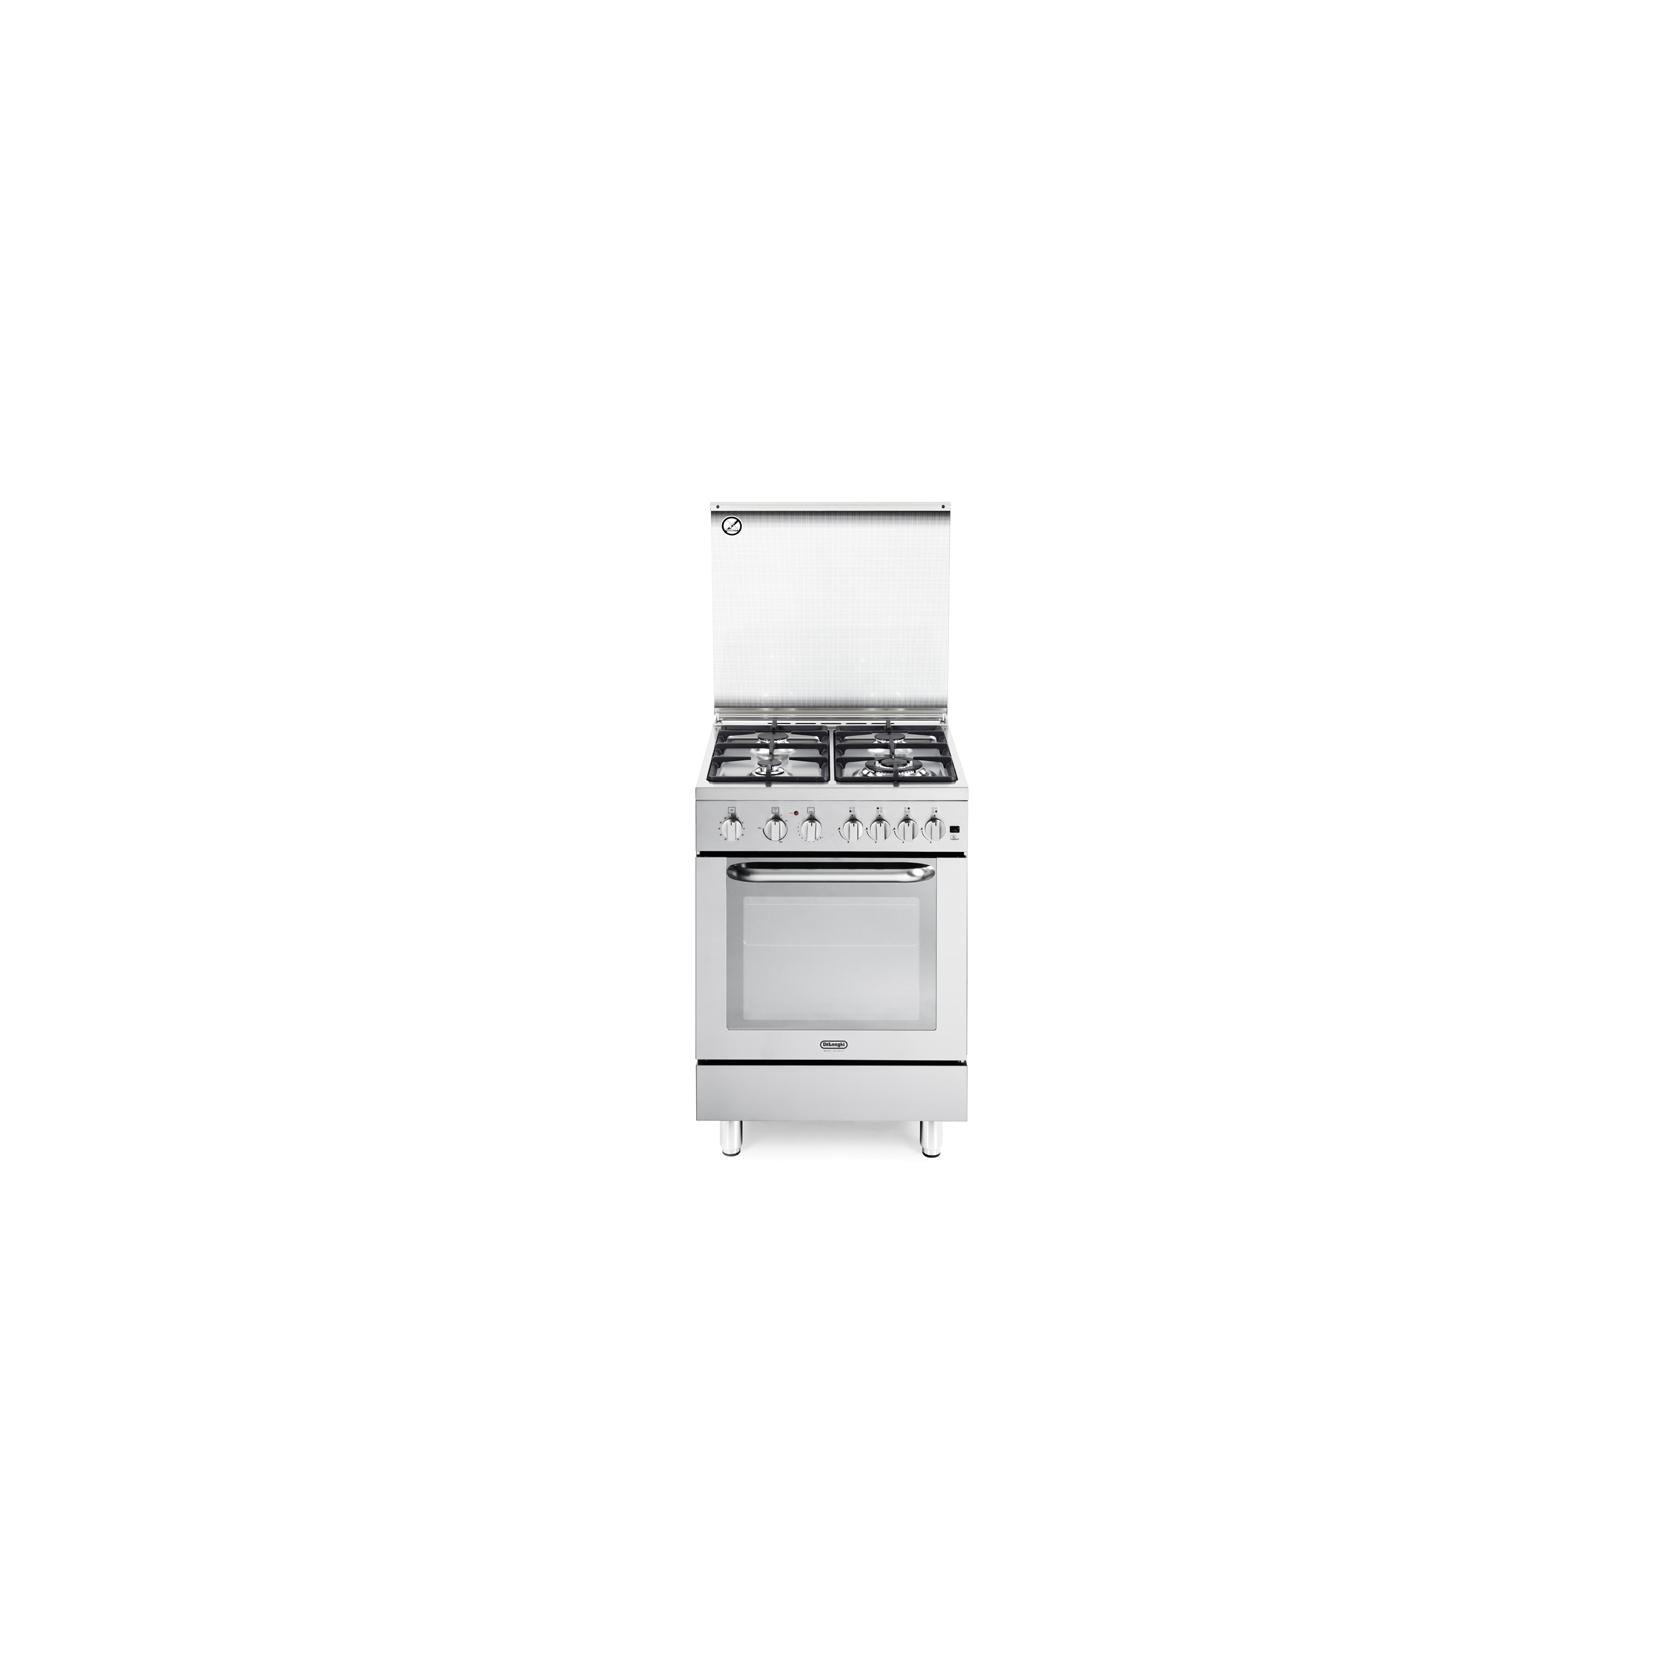 Cucina de longhi dgvx664new 60x60 4 fuochi forno gas ventilato inox immediatamente - Cucine a gas samsung ...